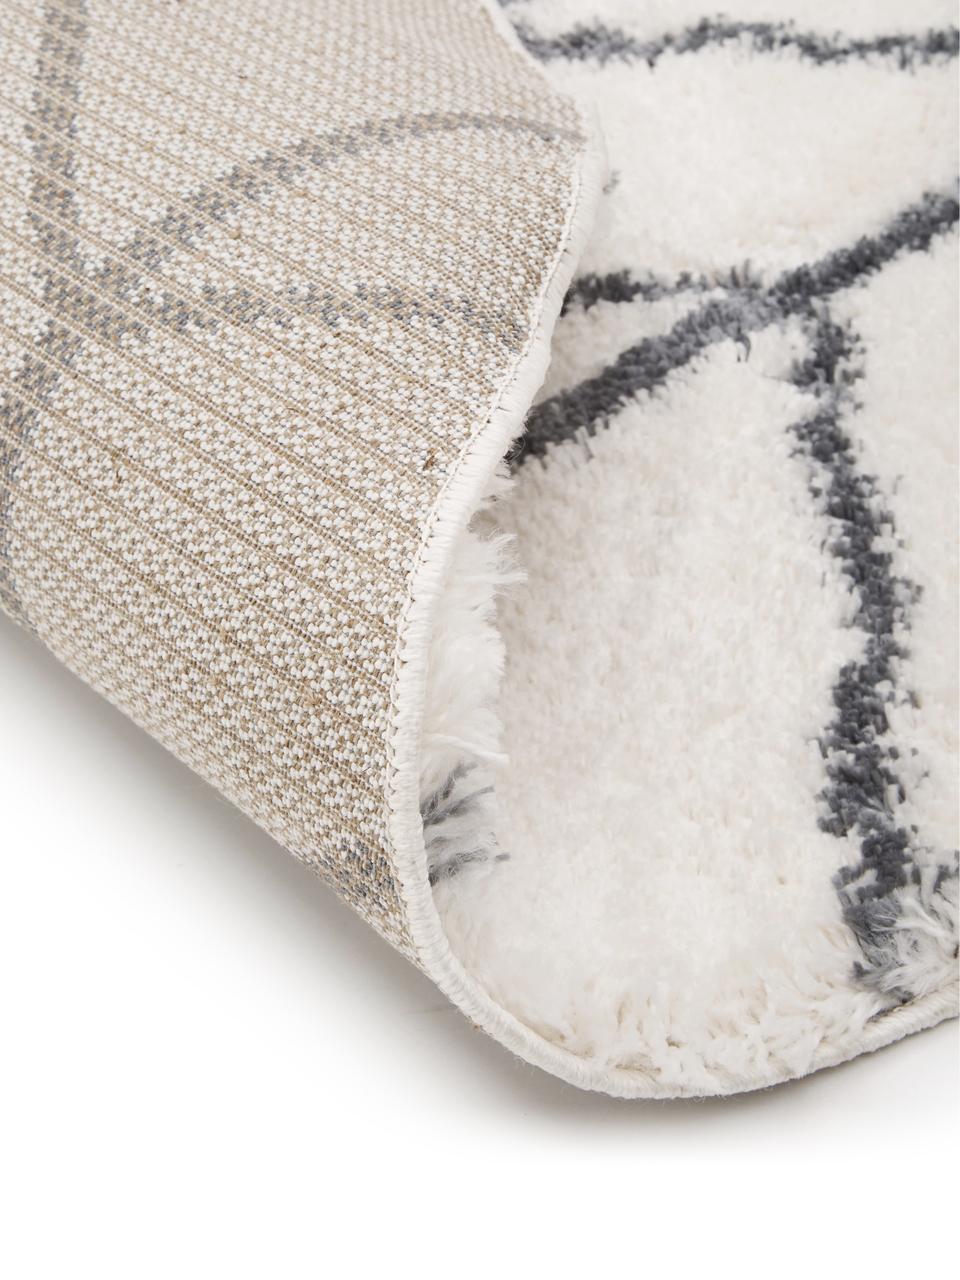 Hochflor-Teppich Cera in Cremeweiß/Dunkelgrau, Flor: 100% Polypropylen, Cremeweiß, Dunkelgrau, Ø 150 cm (Größe M)